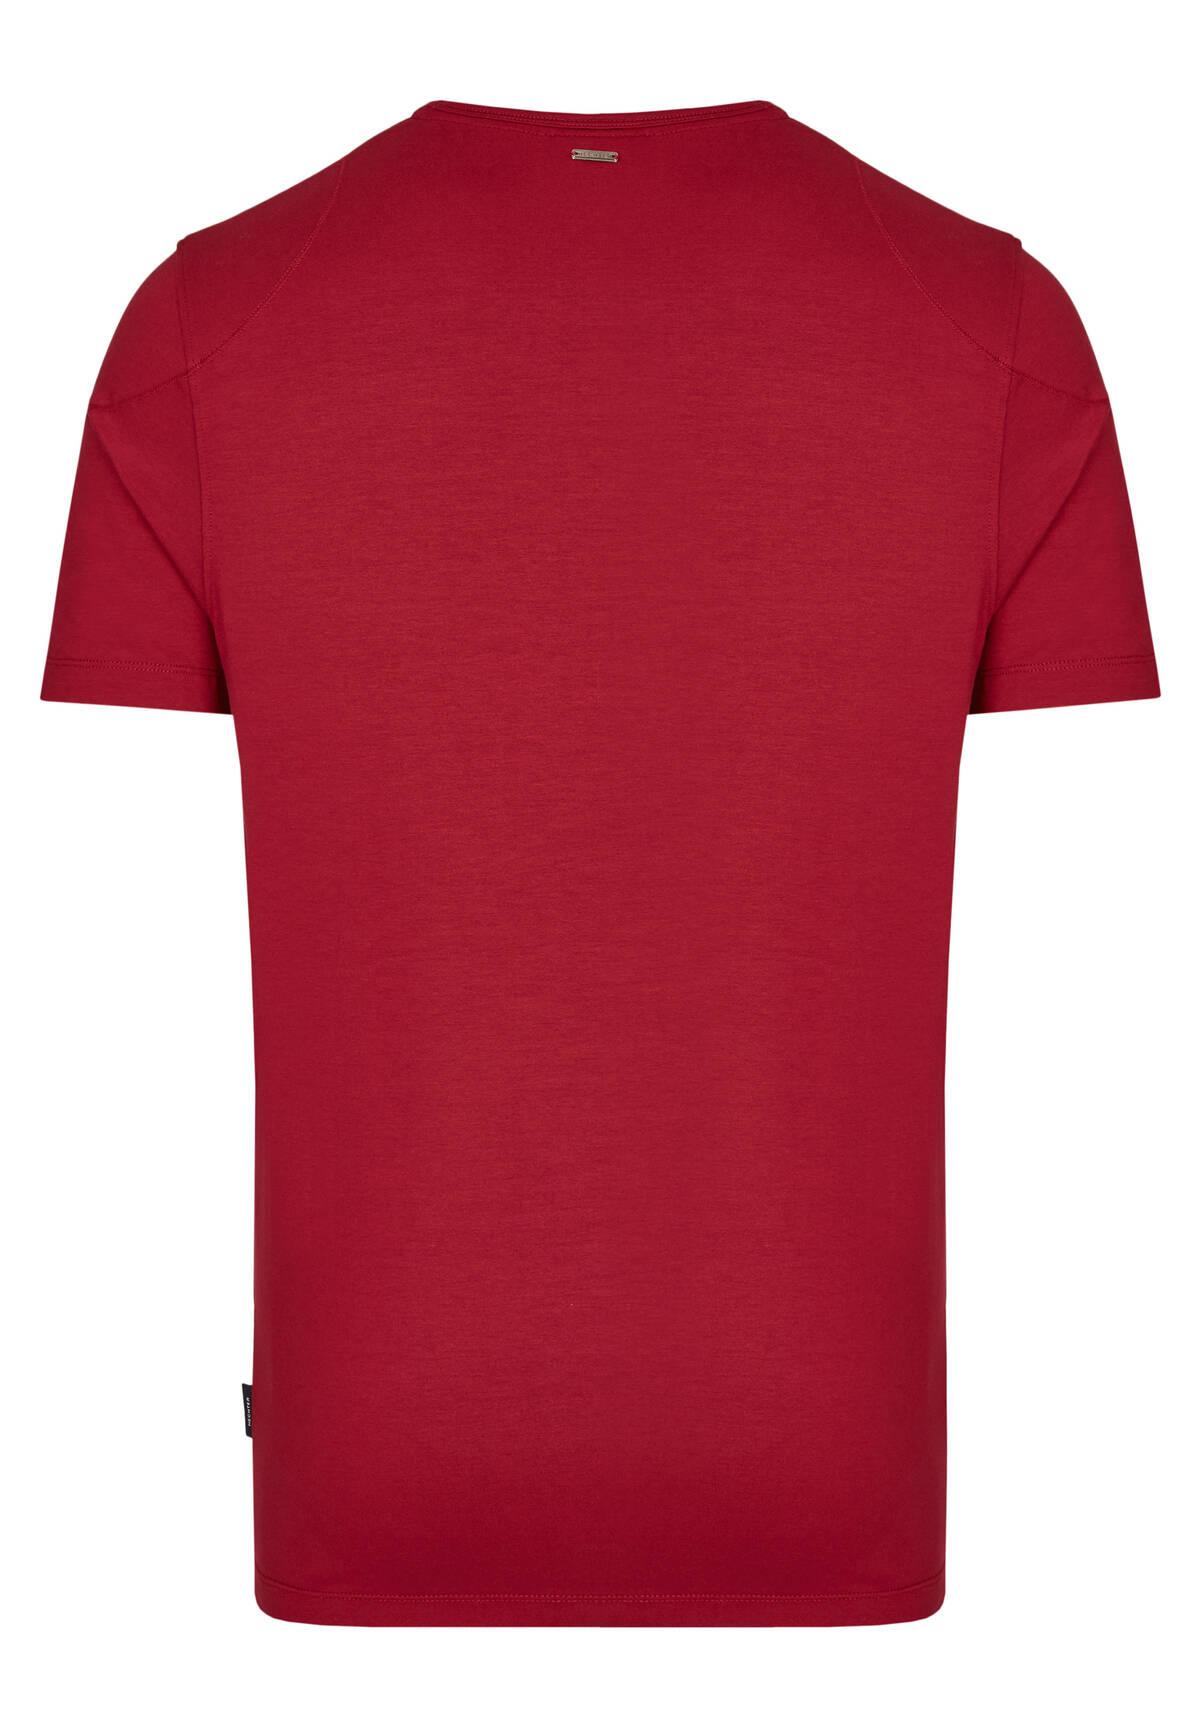 DH-ECO T-shirt manches courtes /